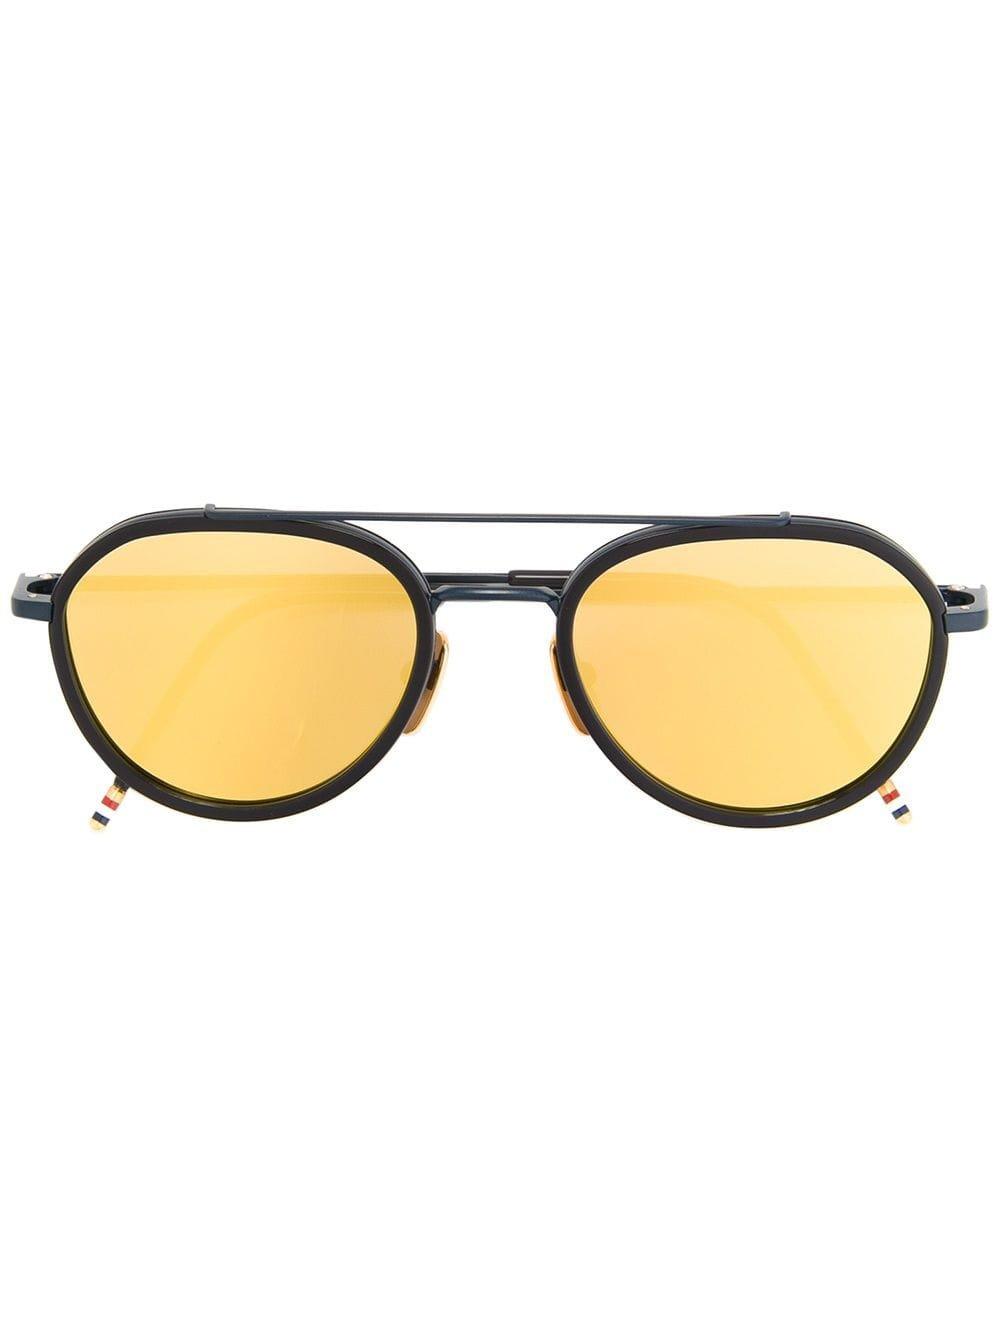 Thom Browne Eyewear Matte Navy & Dark Brown Sunglasses